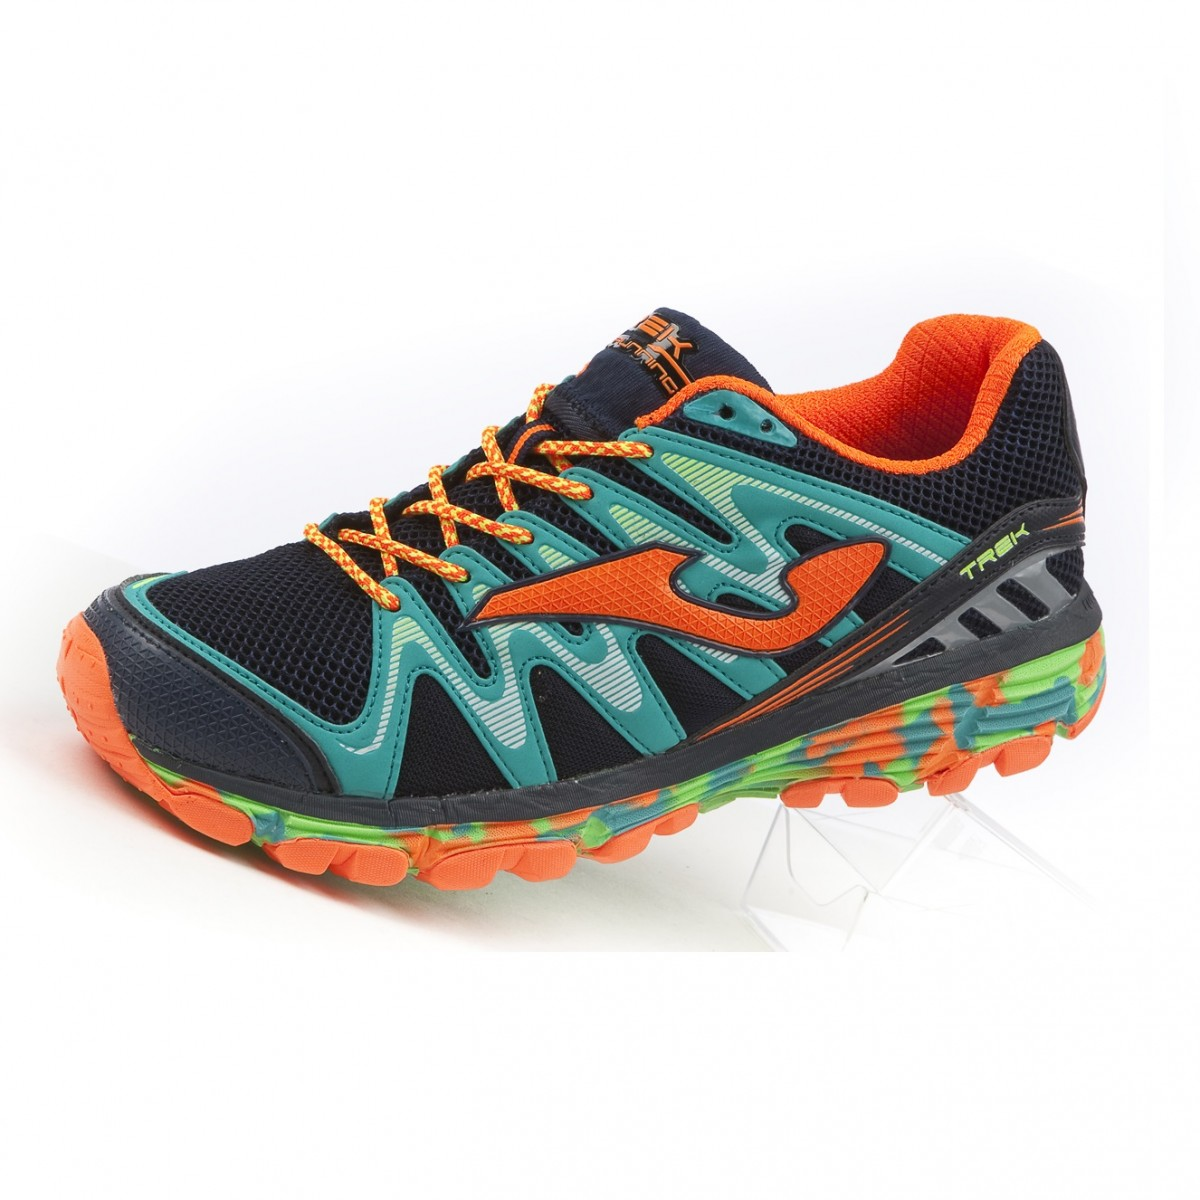 Joma Tk Trek Scarpe trail running uomo navy-green-orange 3812d722645